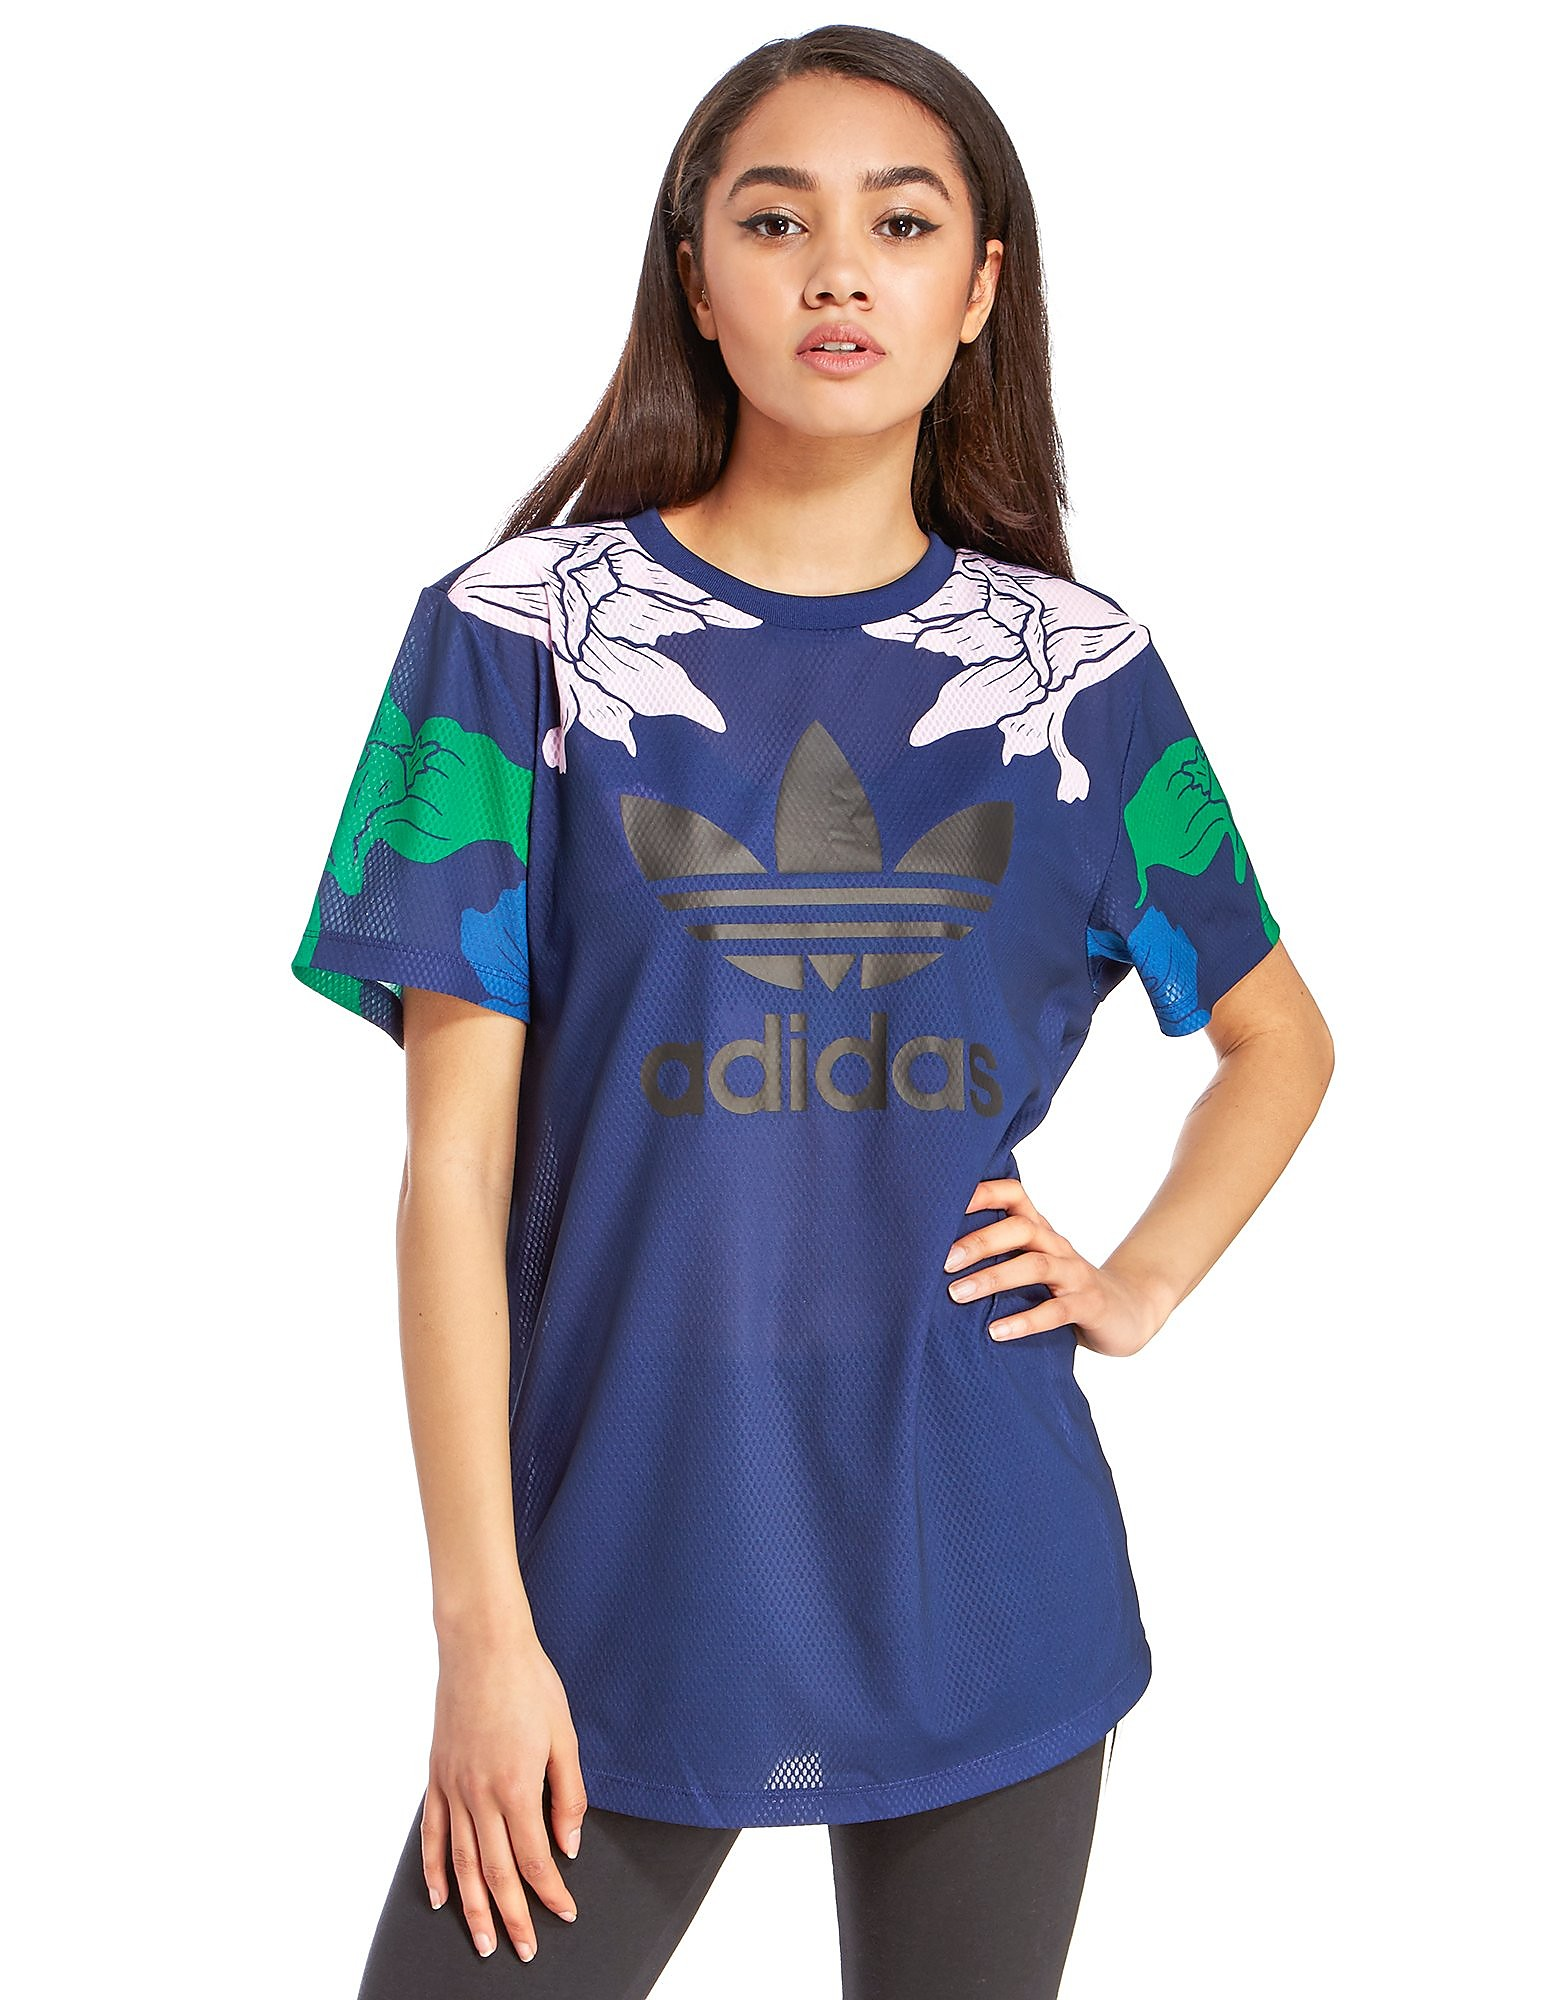 adidas Originals Floral Engraving Boyfriend T-Shirt